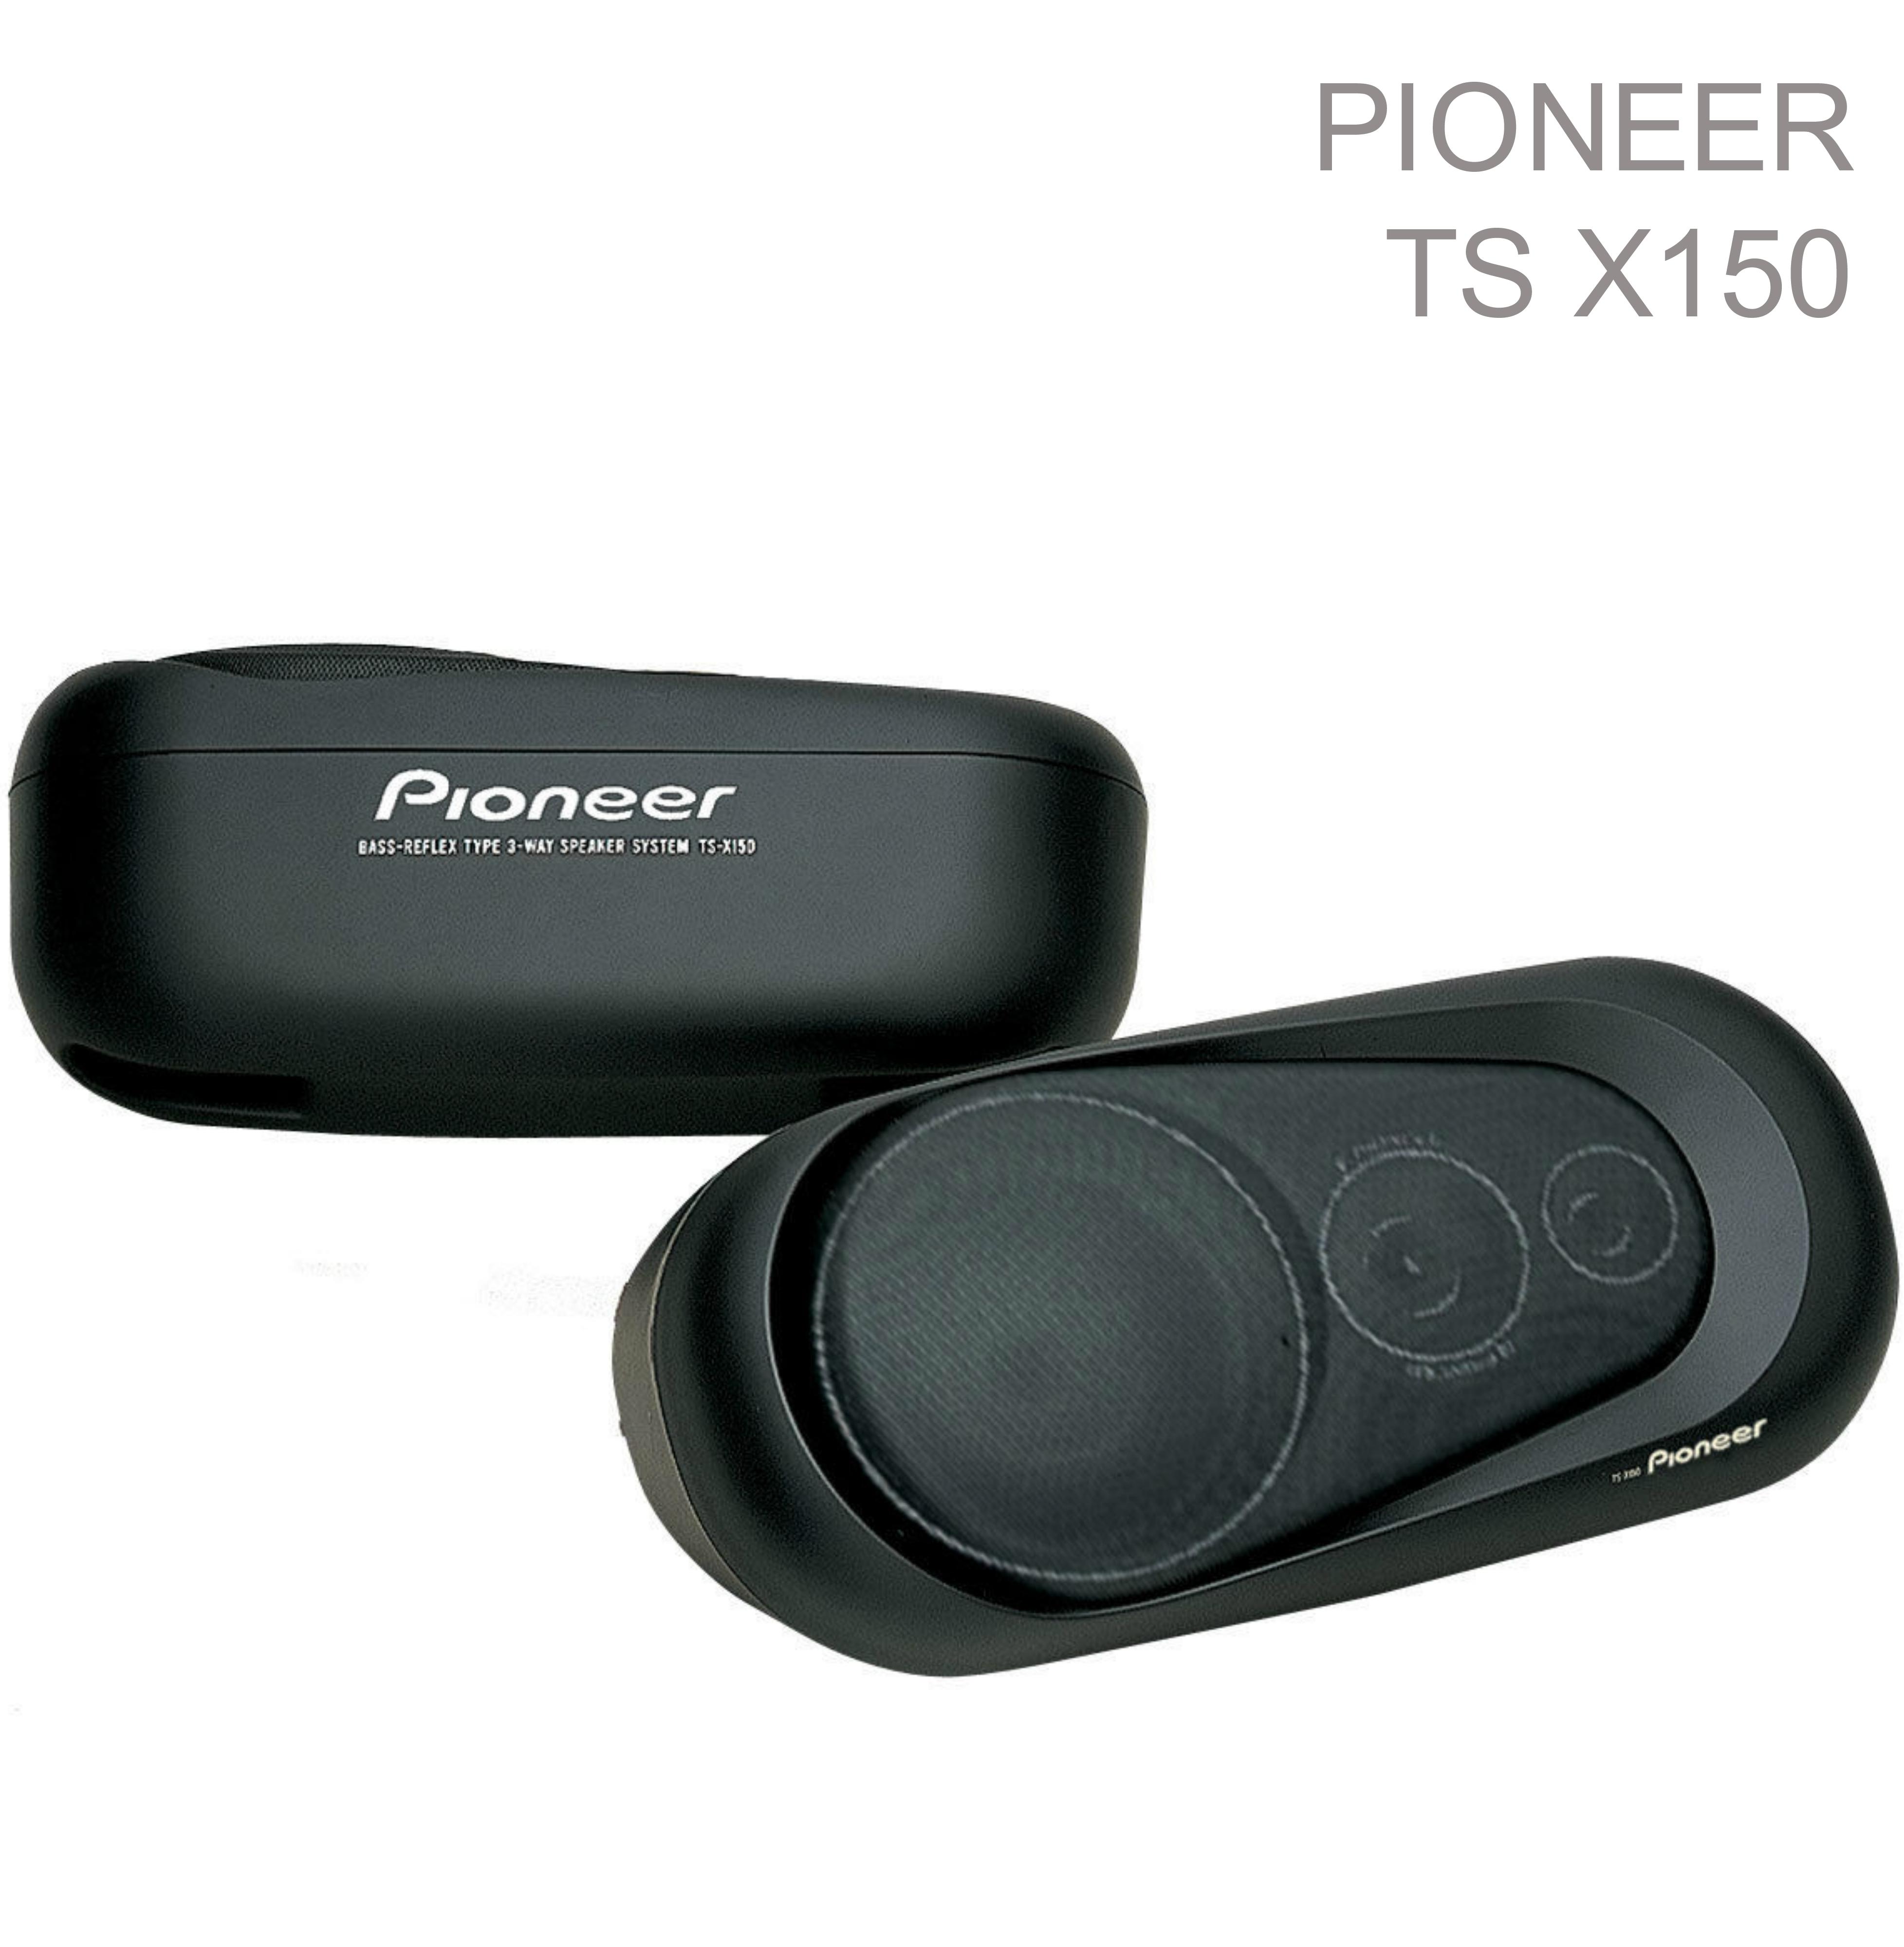 PIONEER TS X150 In Car Audio Sound Speaker Set